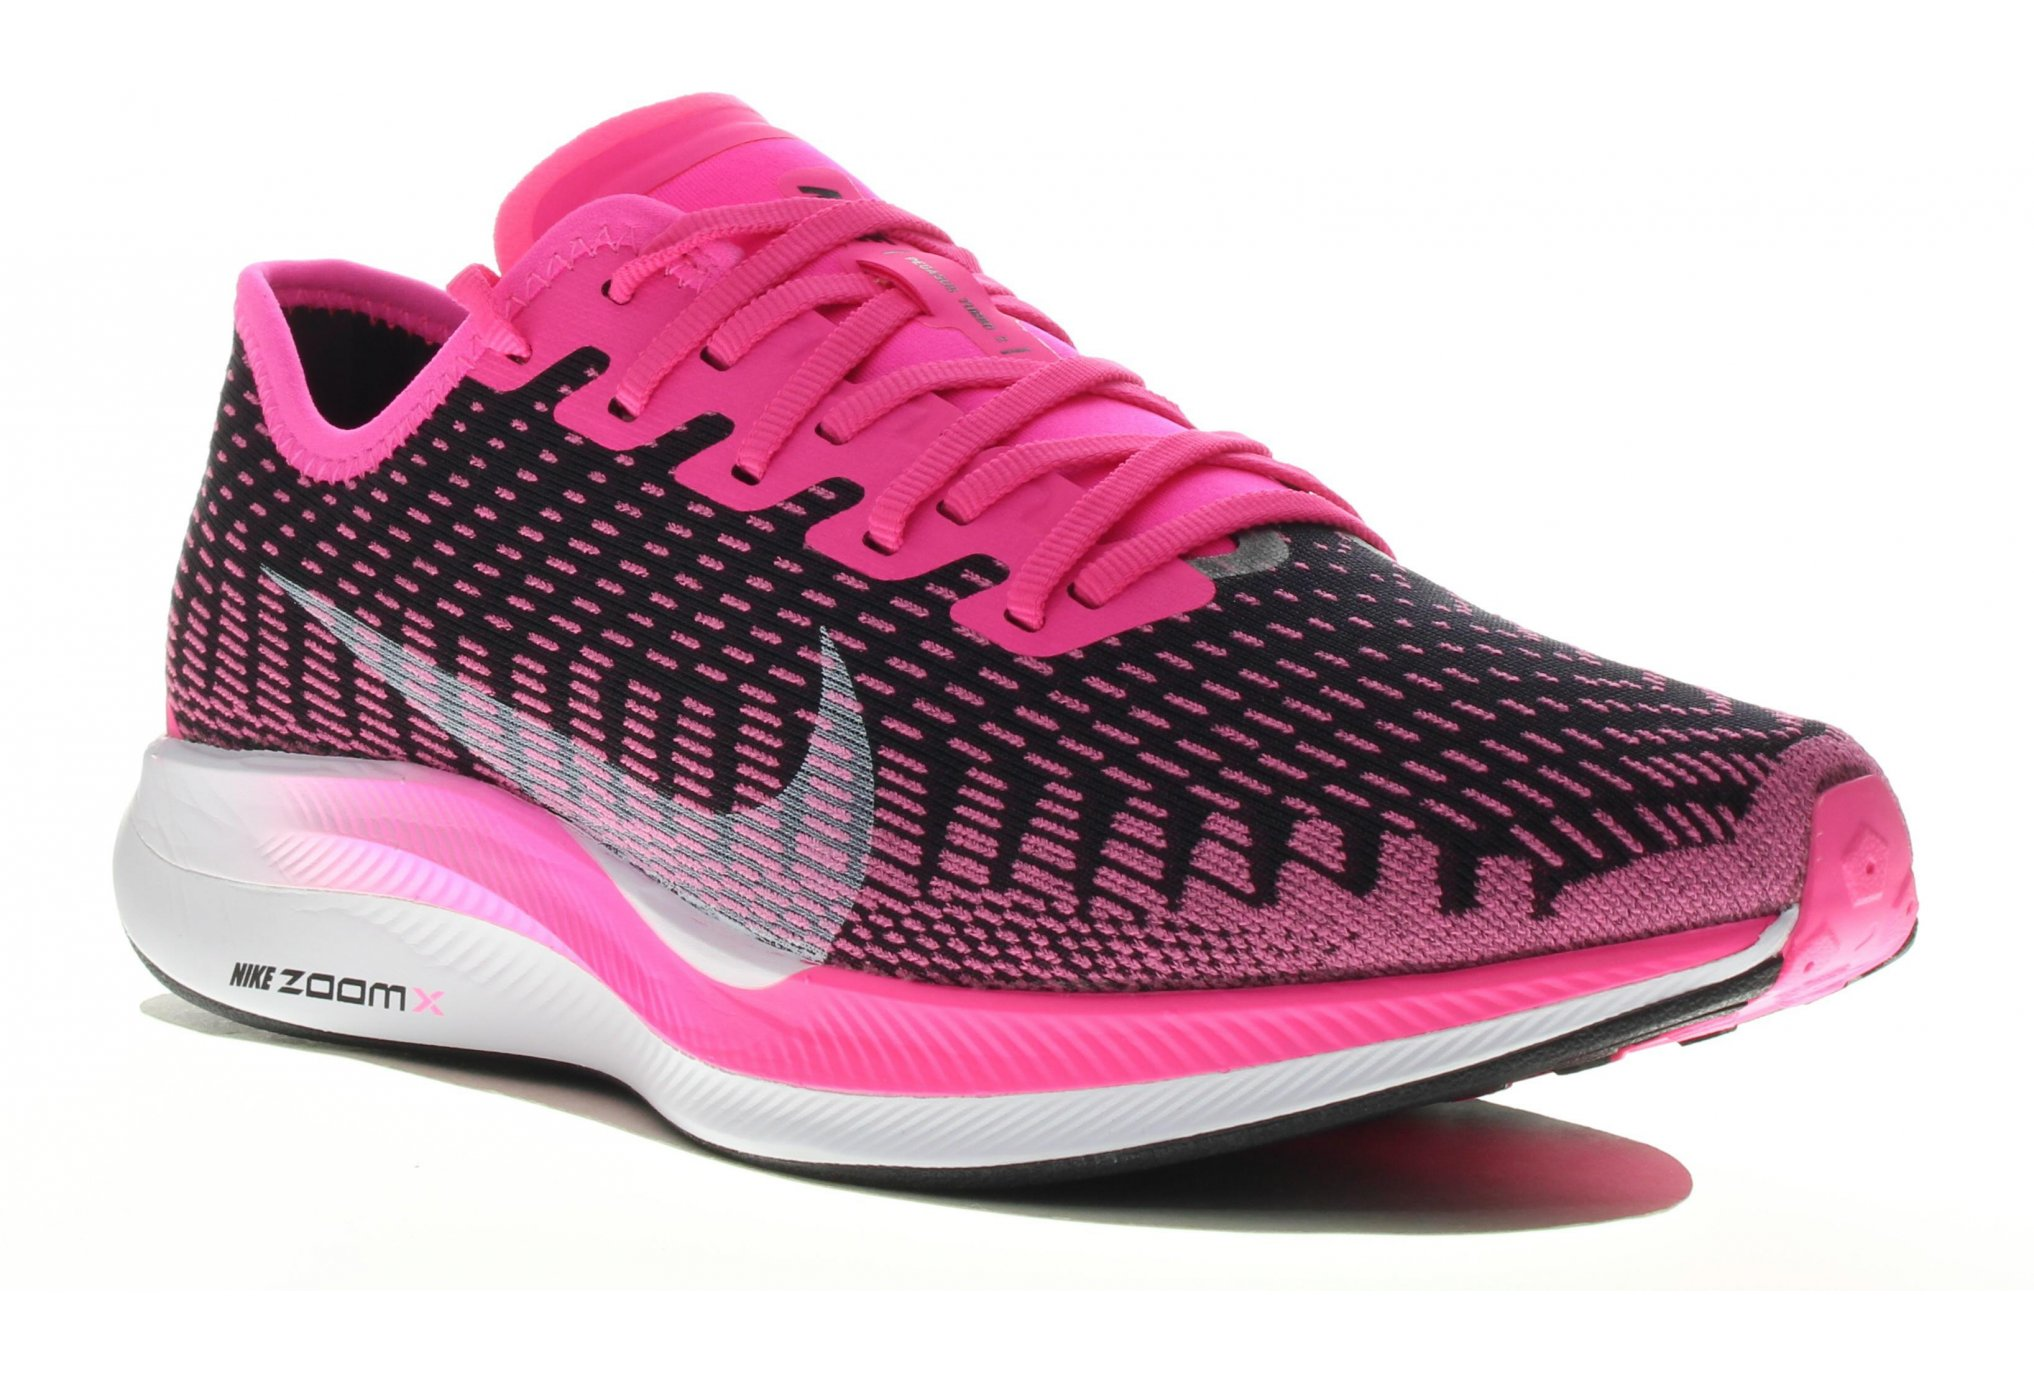 Nike Zoom Pegasus Turbo 2 Chaussures running femme